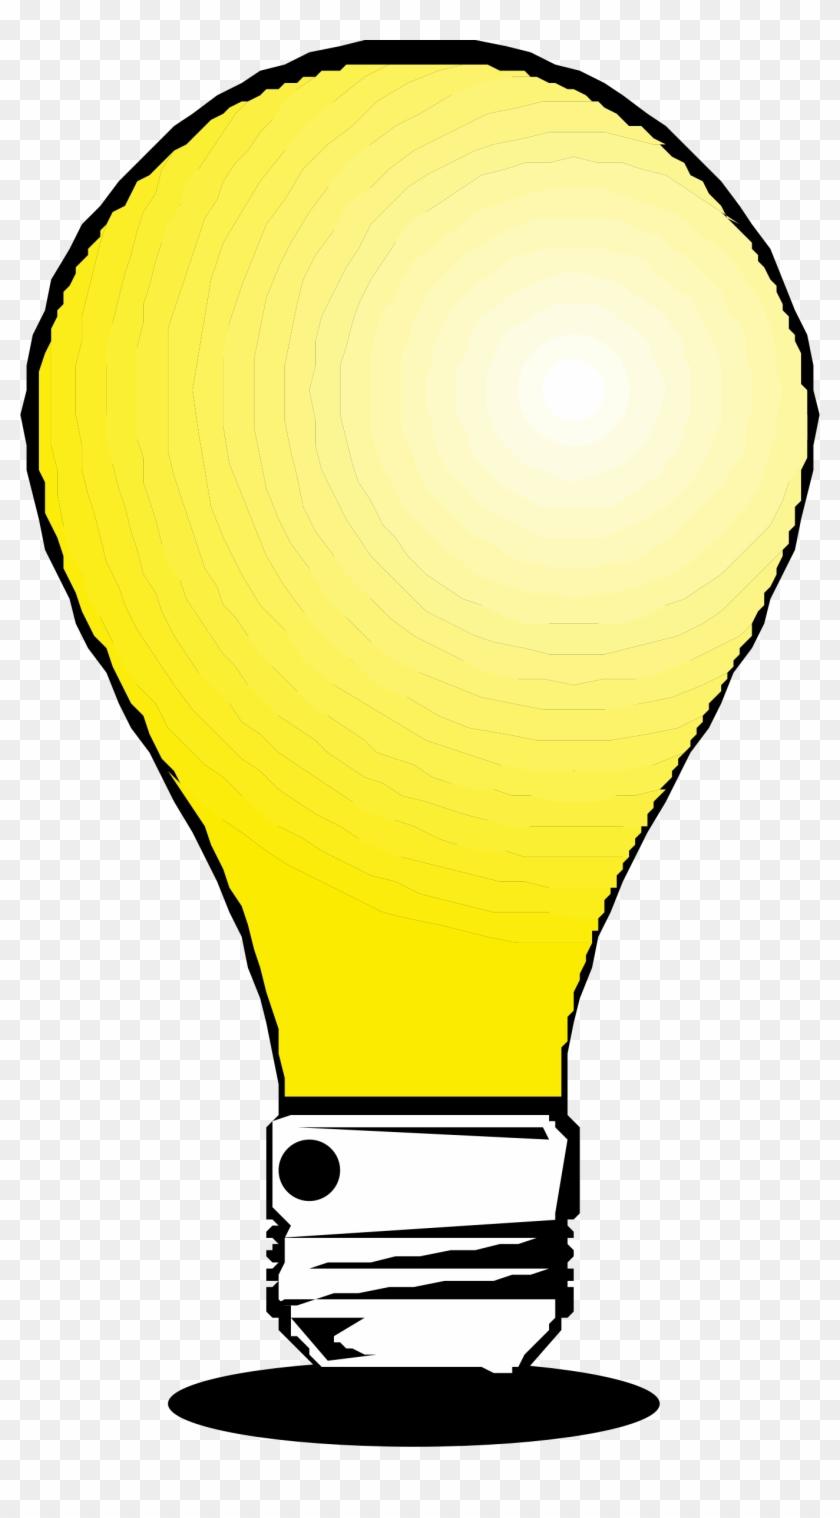 Led clipart clip art download Big Image - Led Light Bulbs Clip Art - Free Transparent PNG Clipart ... clip art download